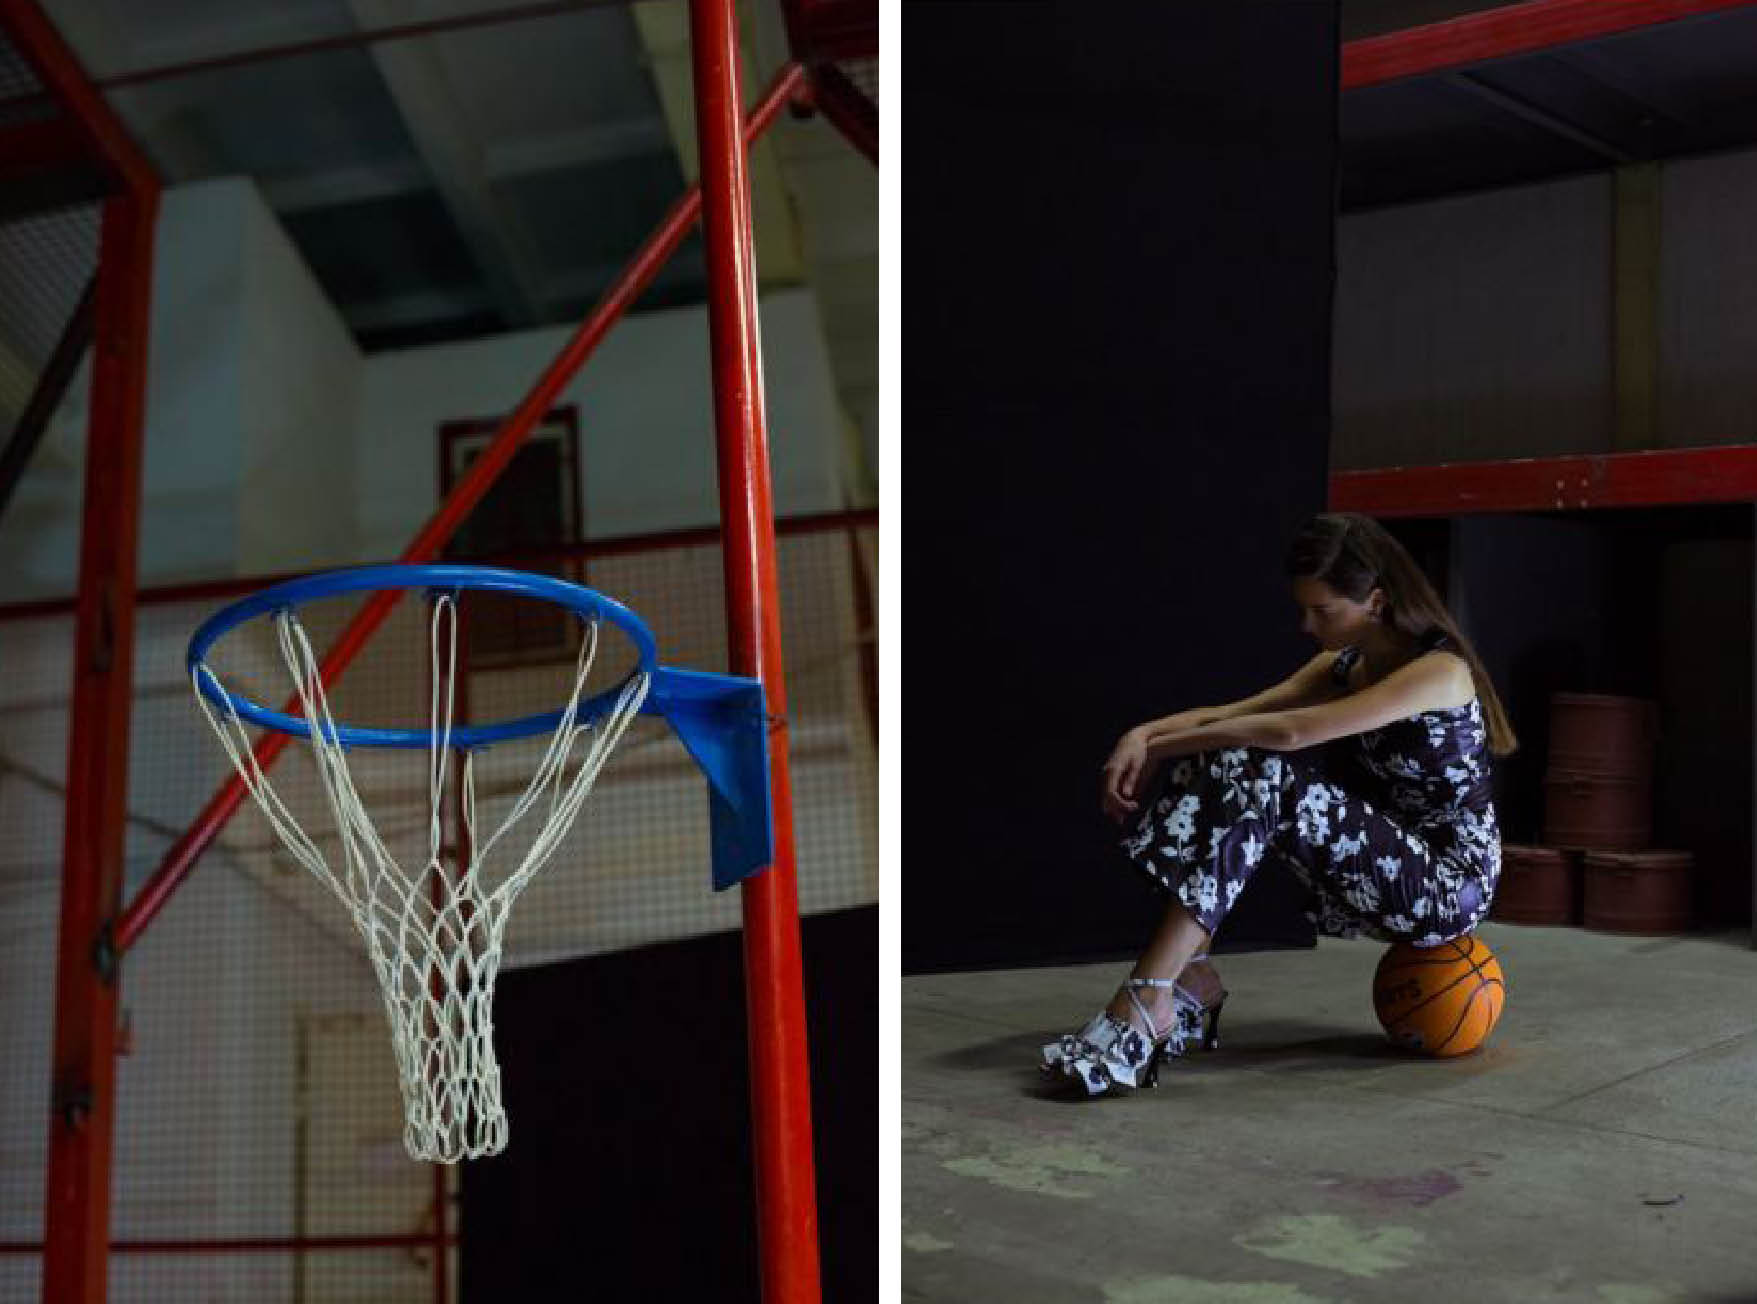 Клиффорд Уильямс в fashion-видео Lake Studio-320x180